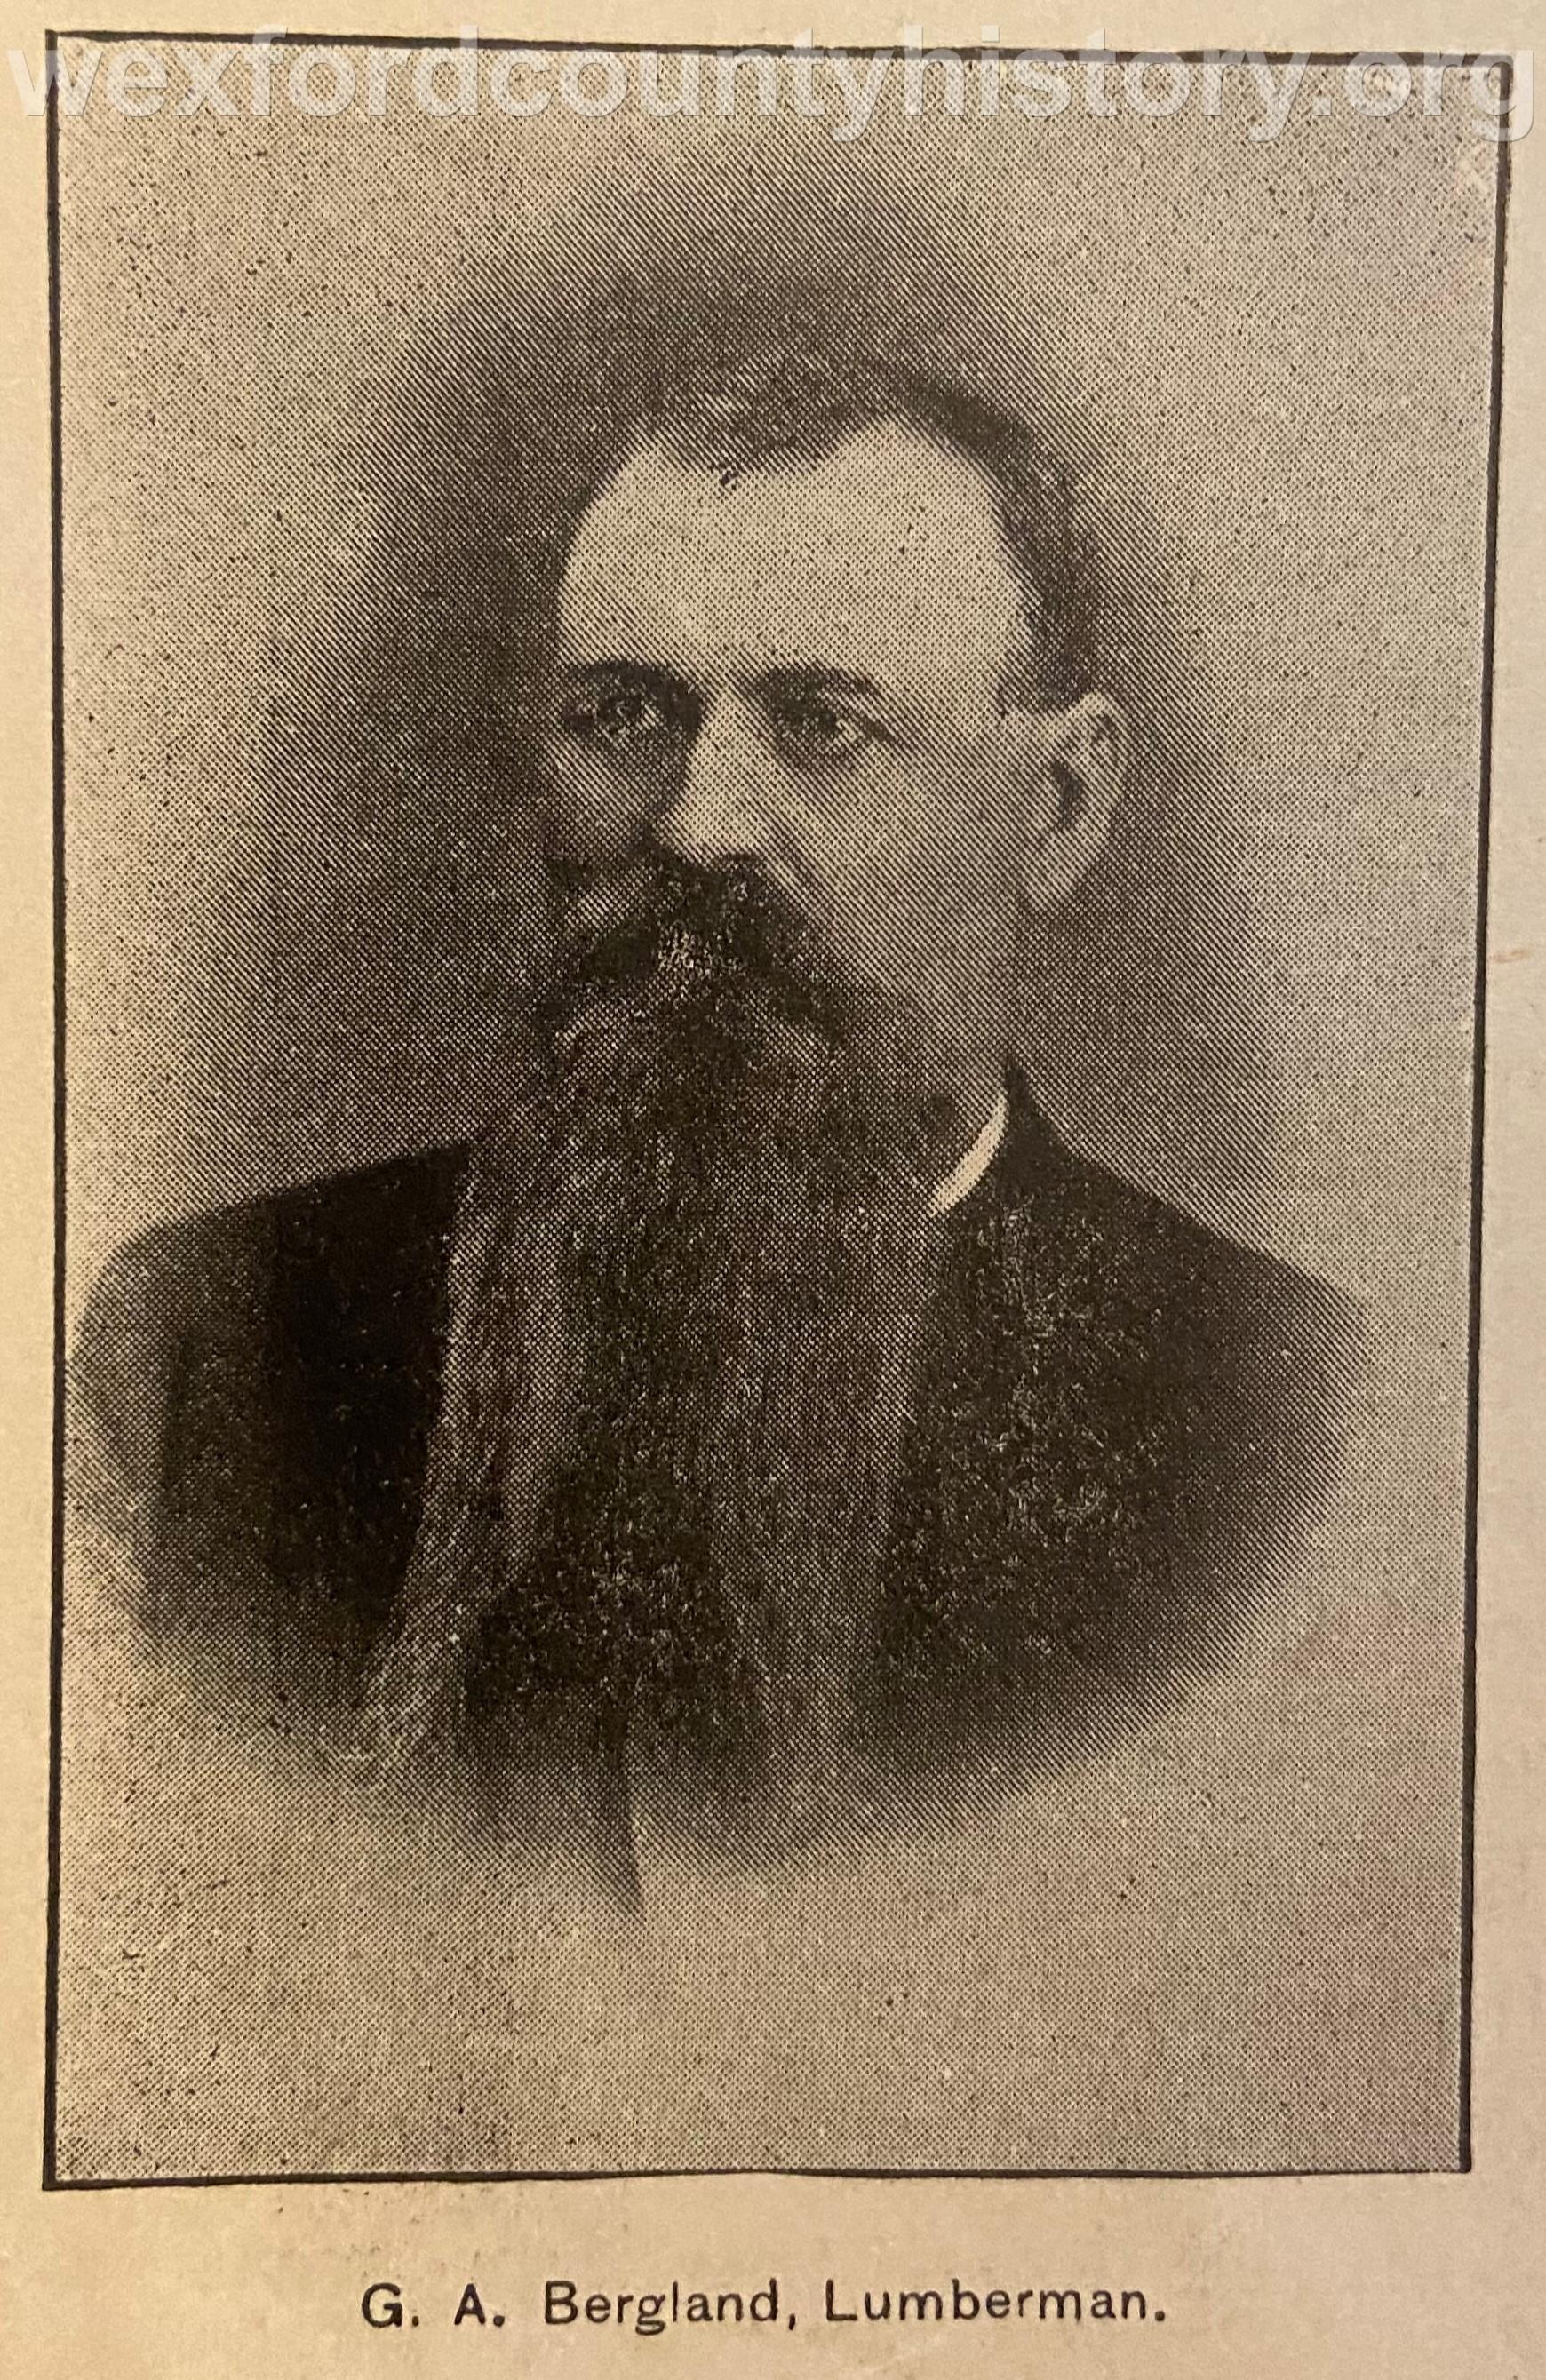 G. A. Bergland